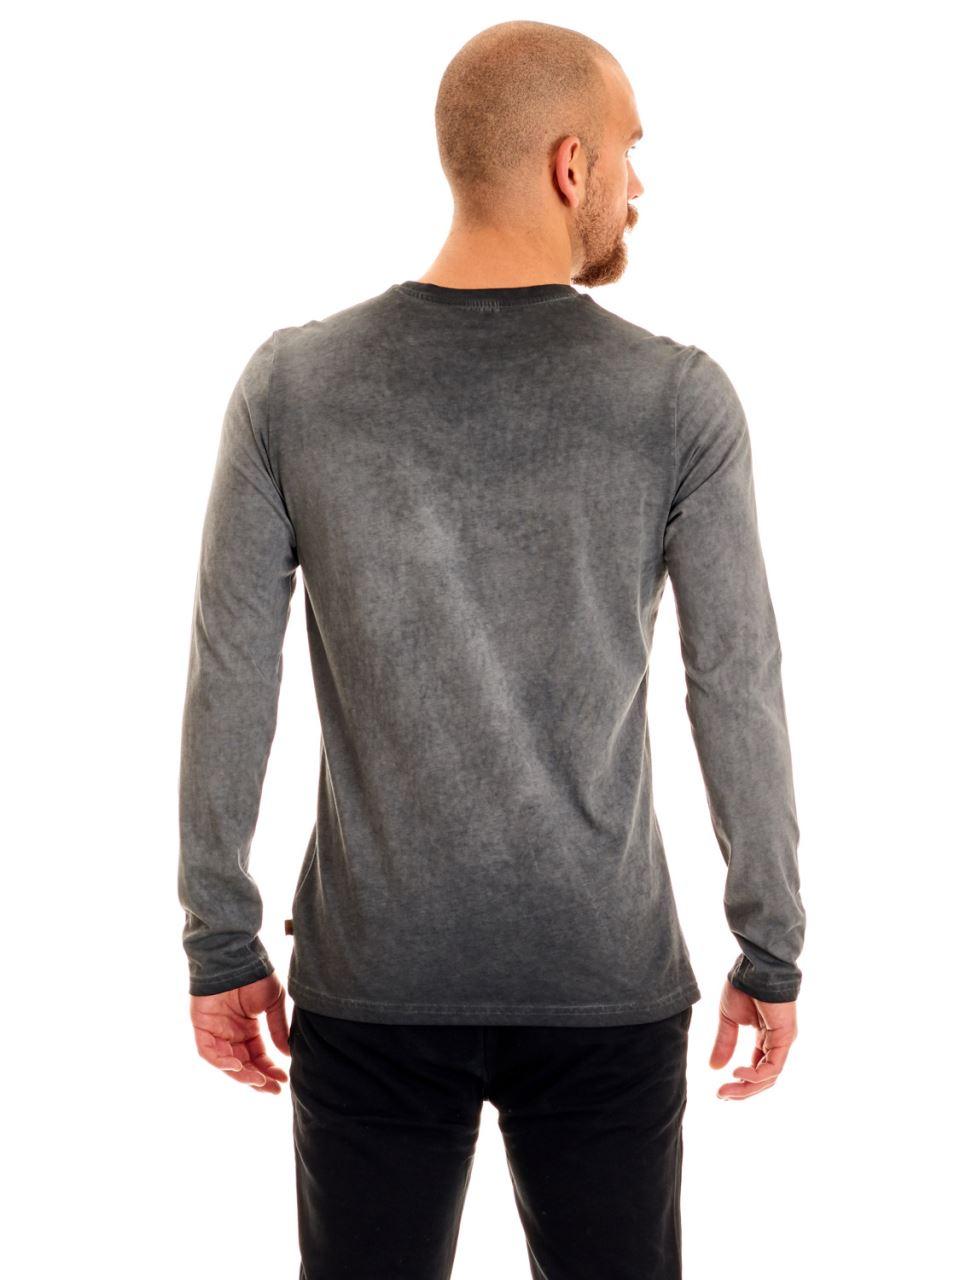 E95089 T-shirt